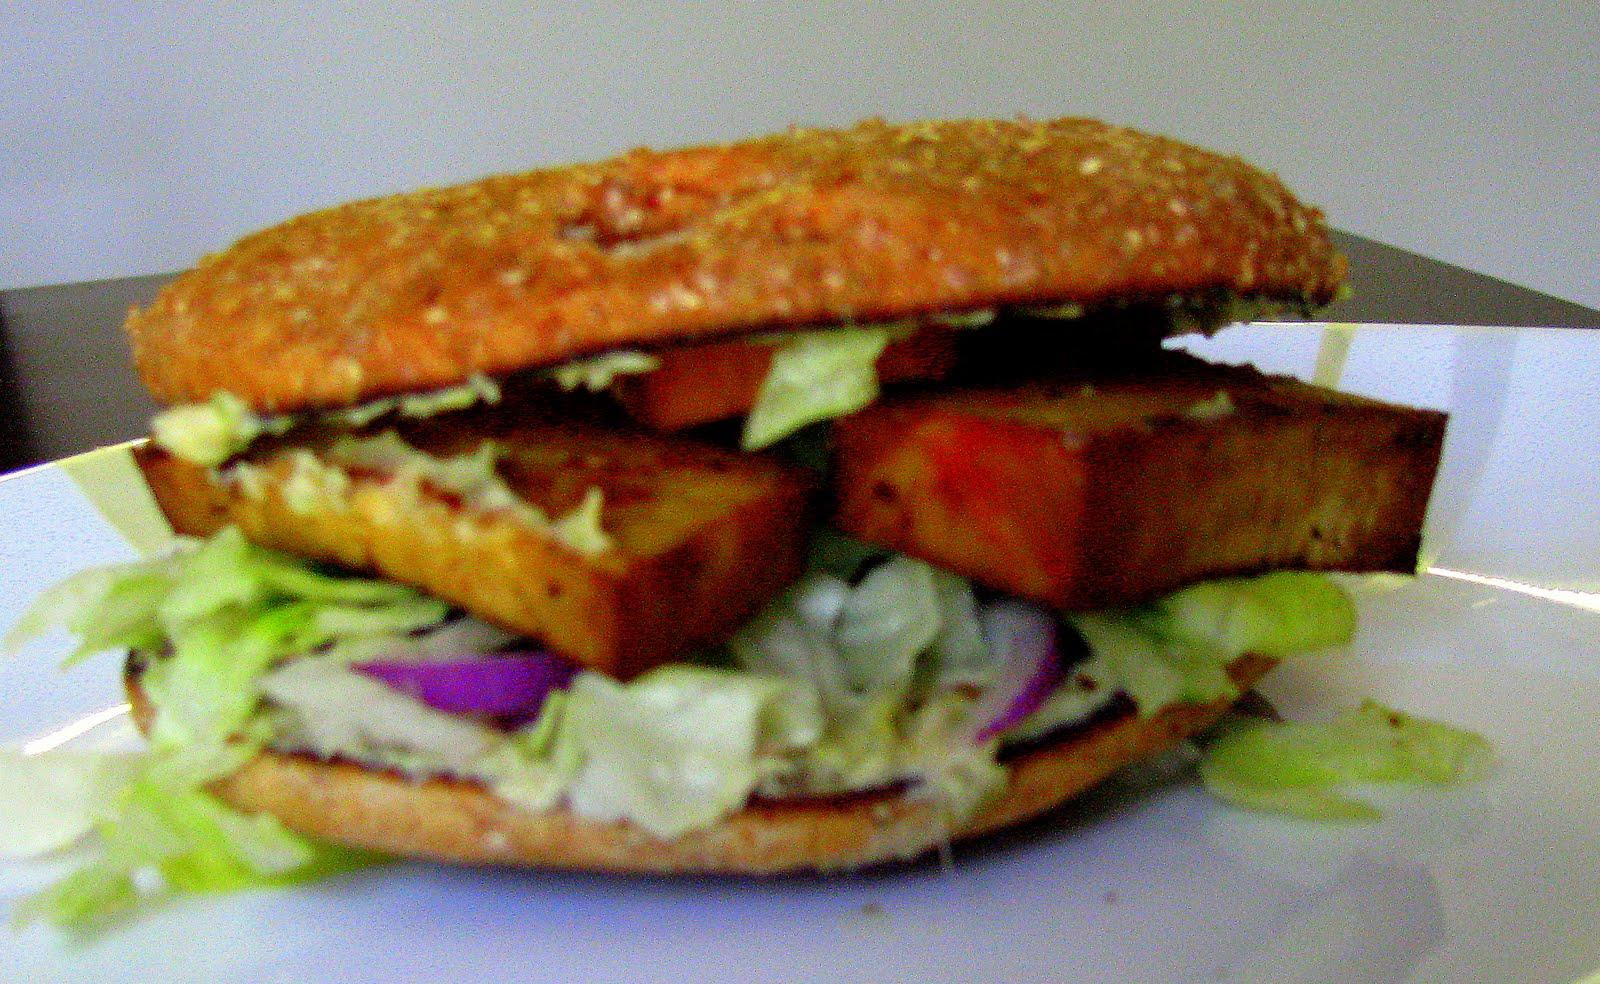 YummO: Tofu and hummus bagelwich